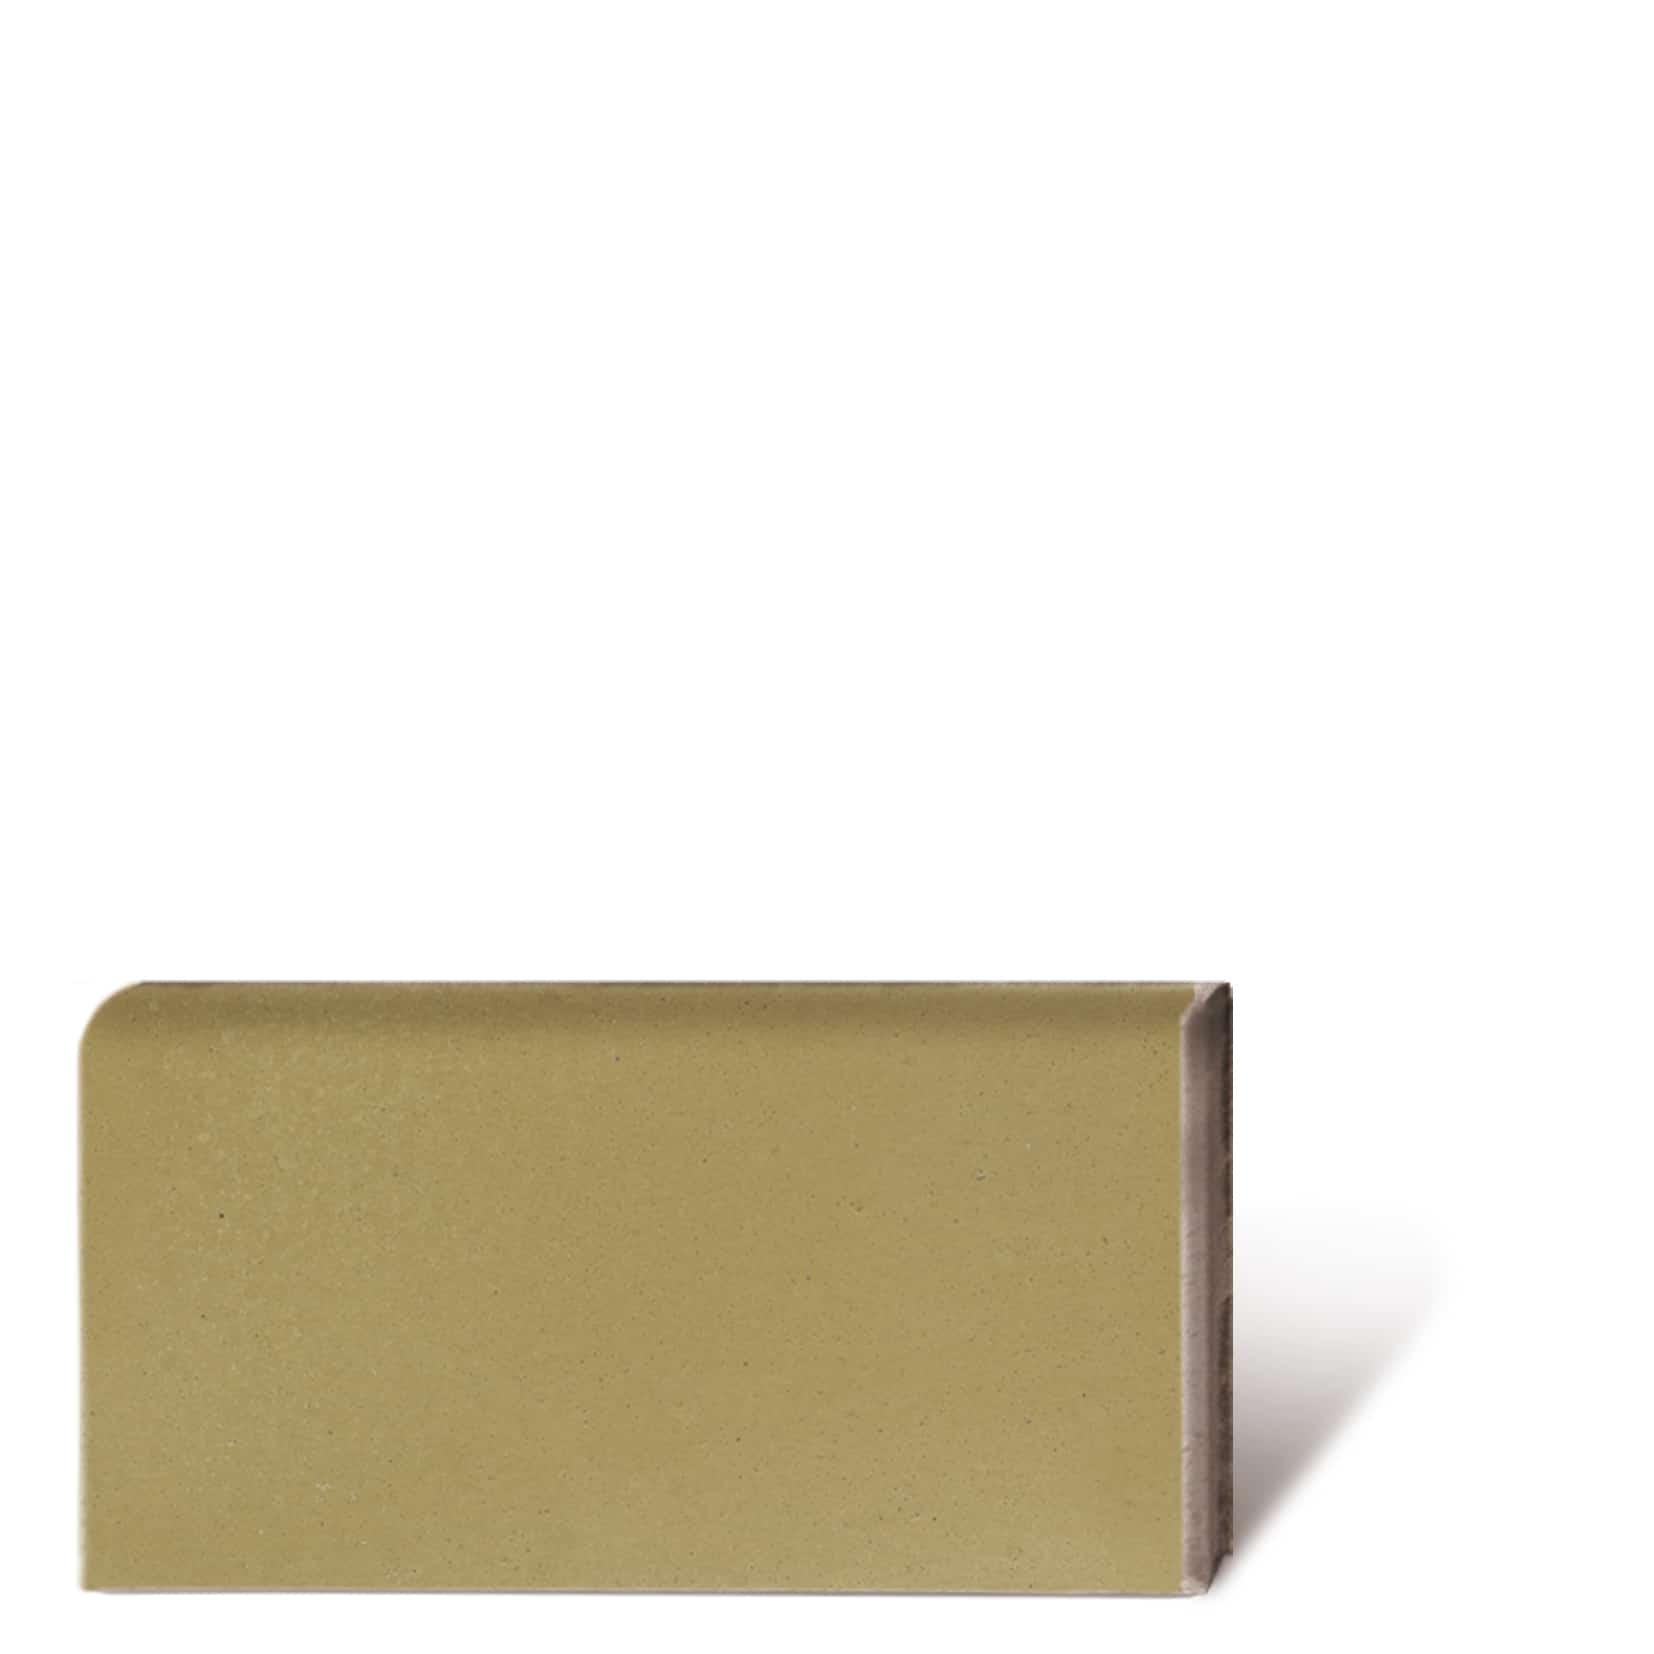 zementfliesen-terrazzofliesen-kreidefarbe-terrazzo-fugenlos-viaplatten-sockel-71w | 71w